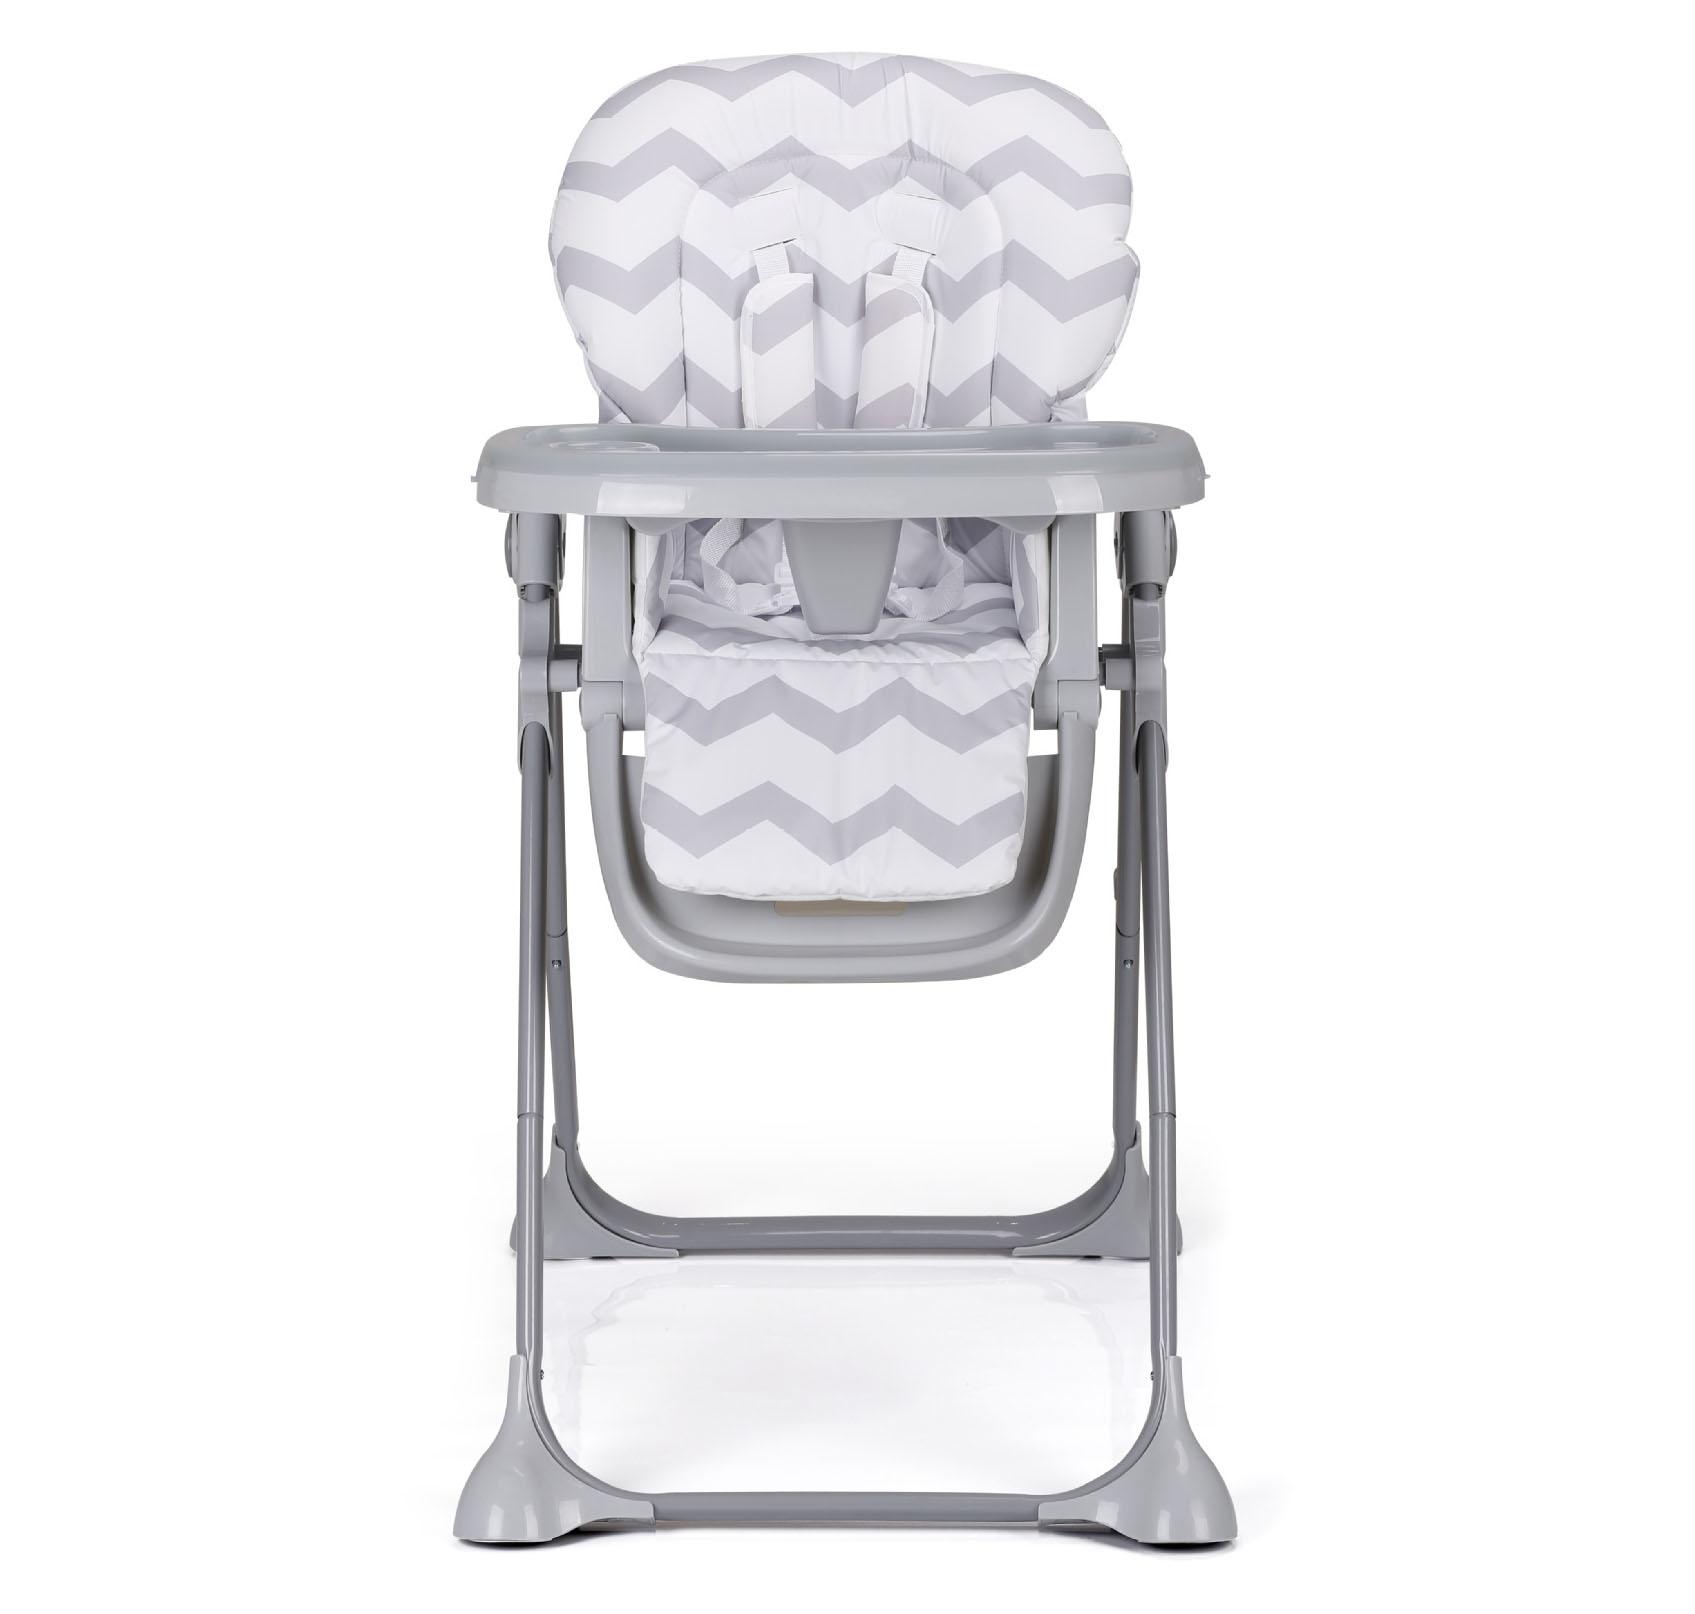 Harari Baby simple plastic baby high chair company for feeding-1